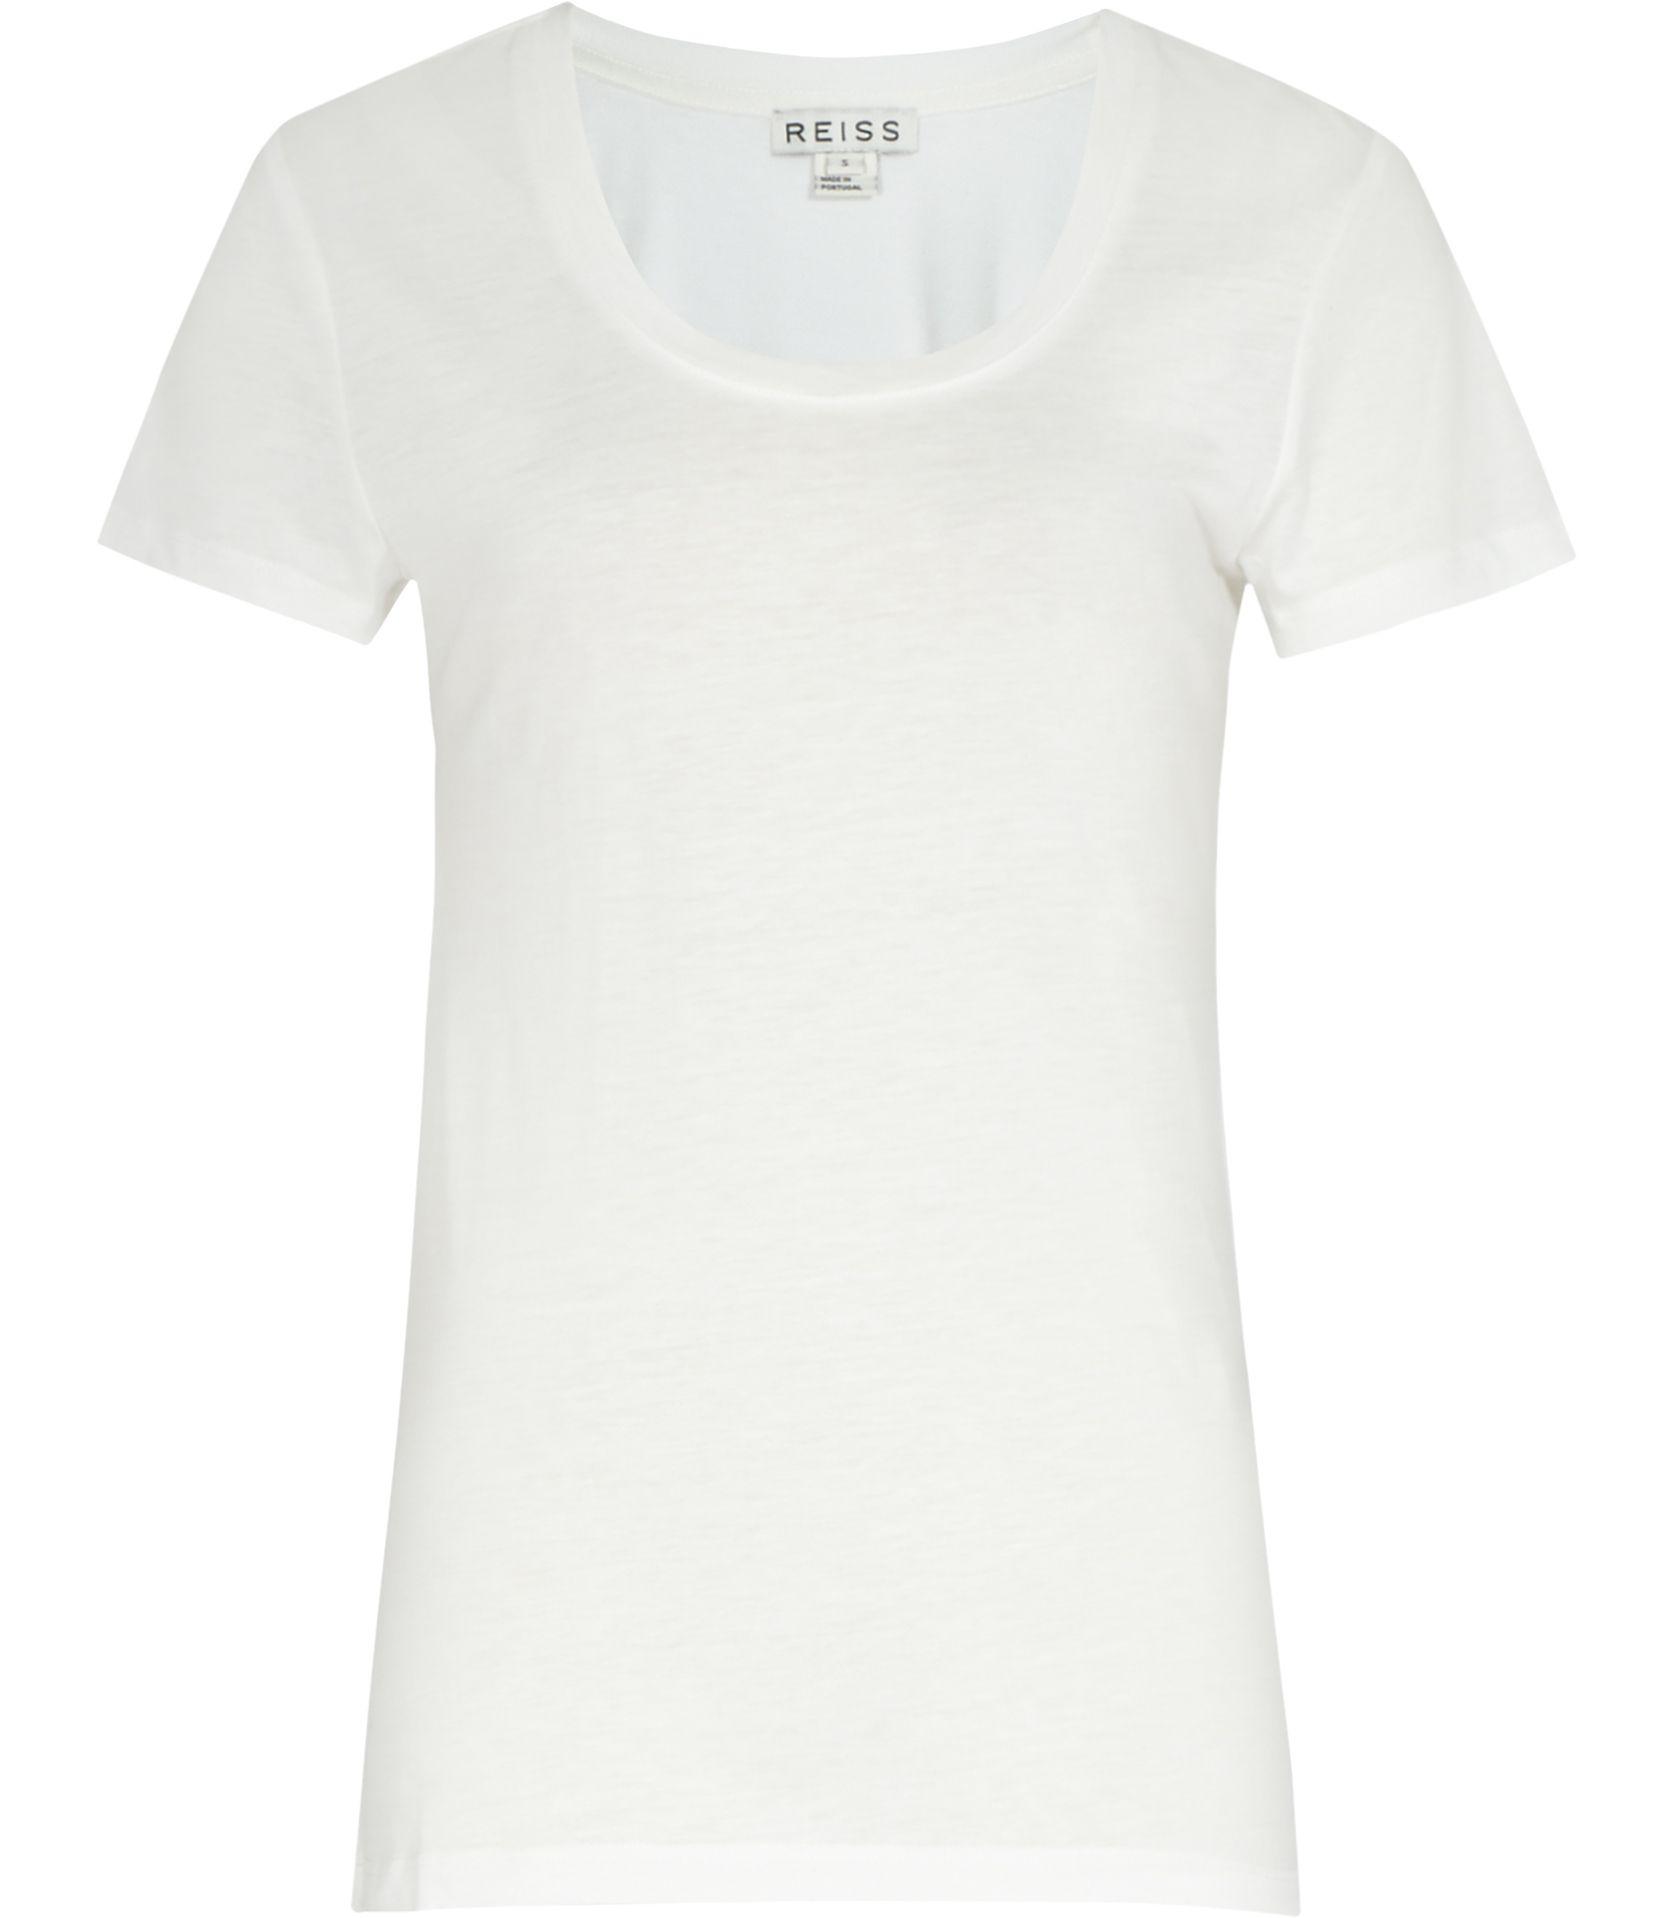 Black t shirt reiss - Reiss London Daina Womens Off White Scoop Neck T Shirt Also